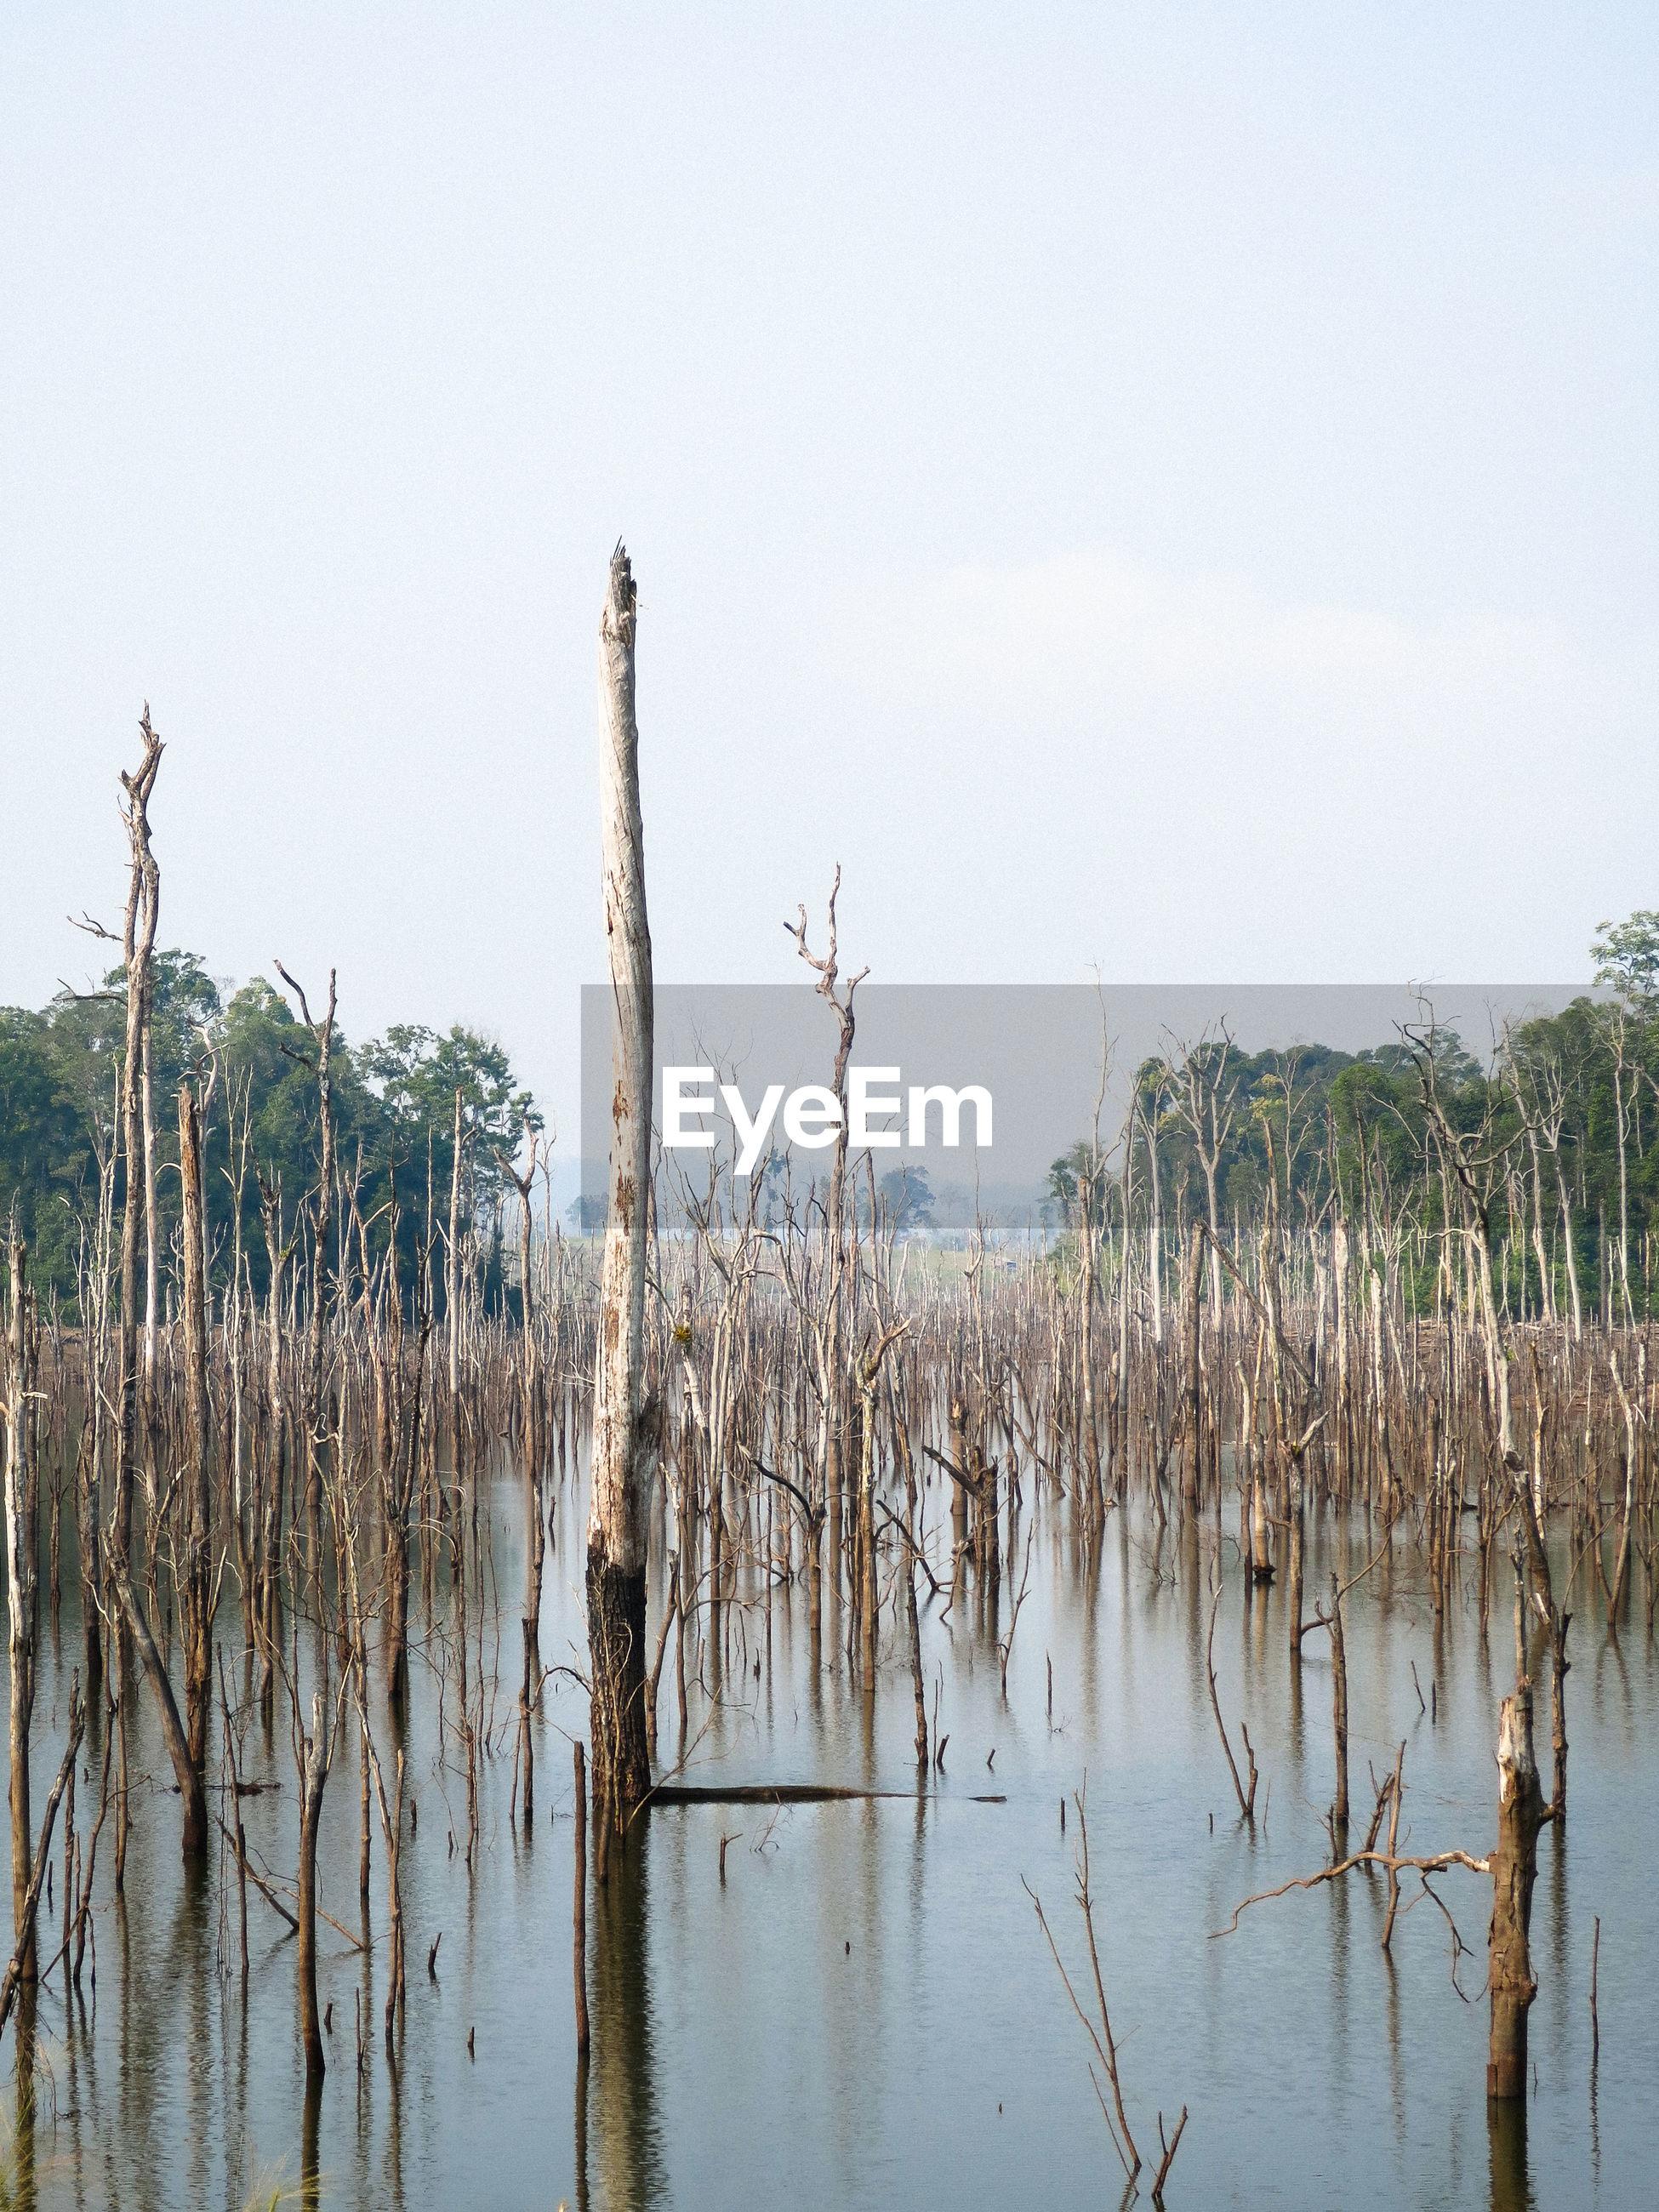 PANORAMIC VIEW OF REEDS AGAINST LAKE